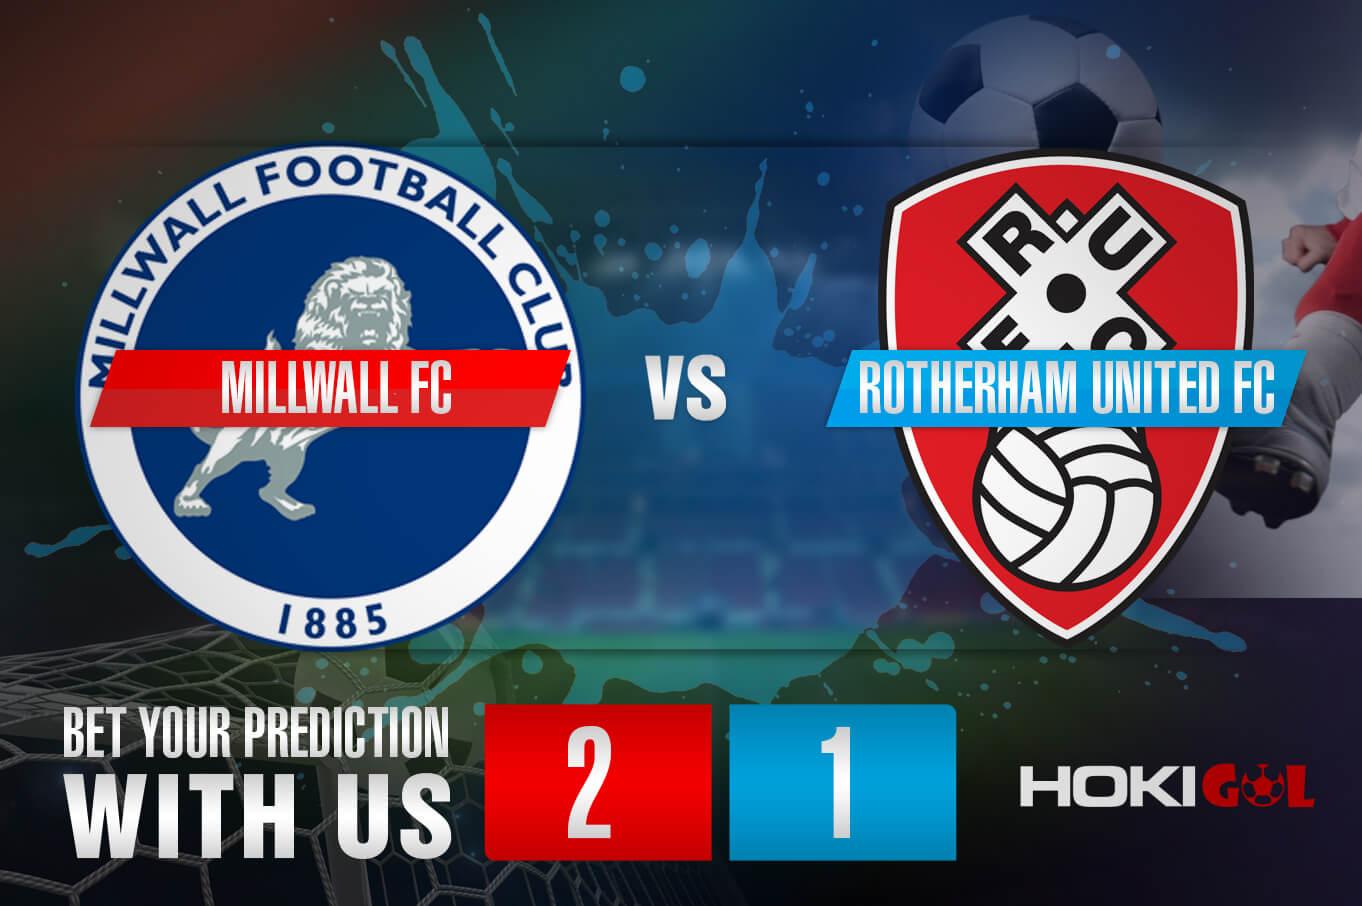 Prediksi Bola Millwall FC Vs Rotherham United FC 2 April 2021